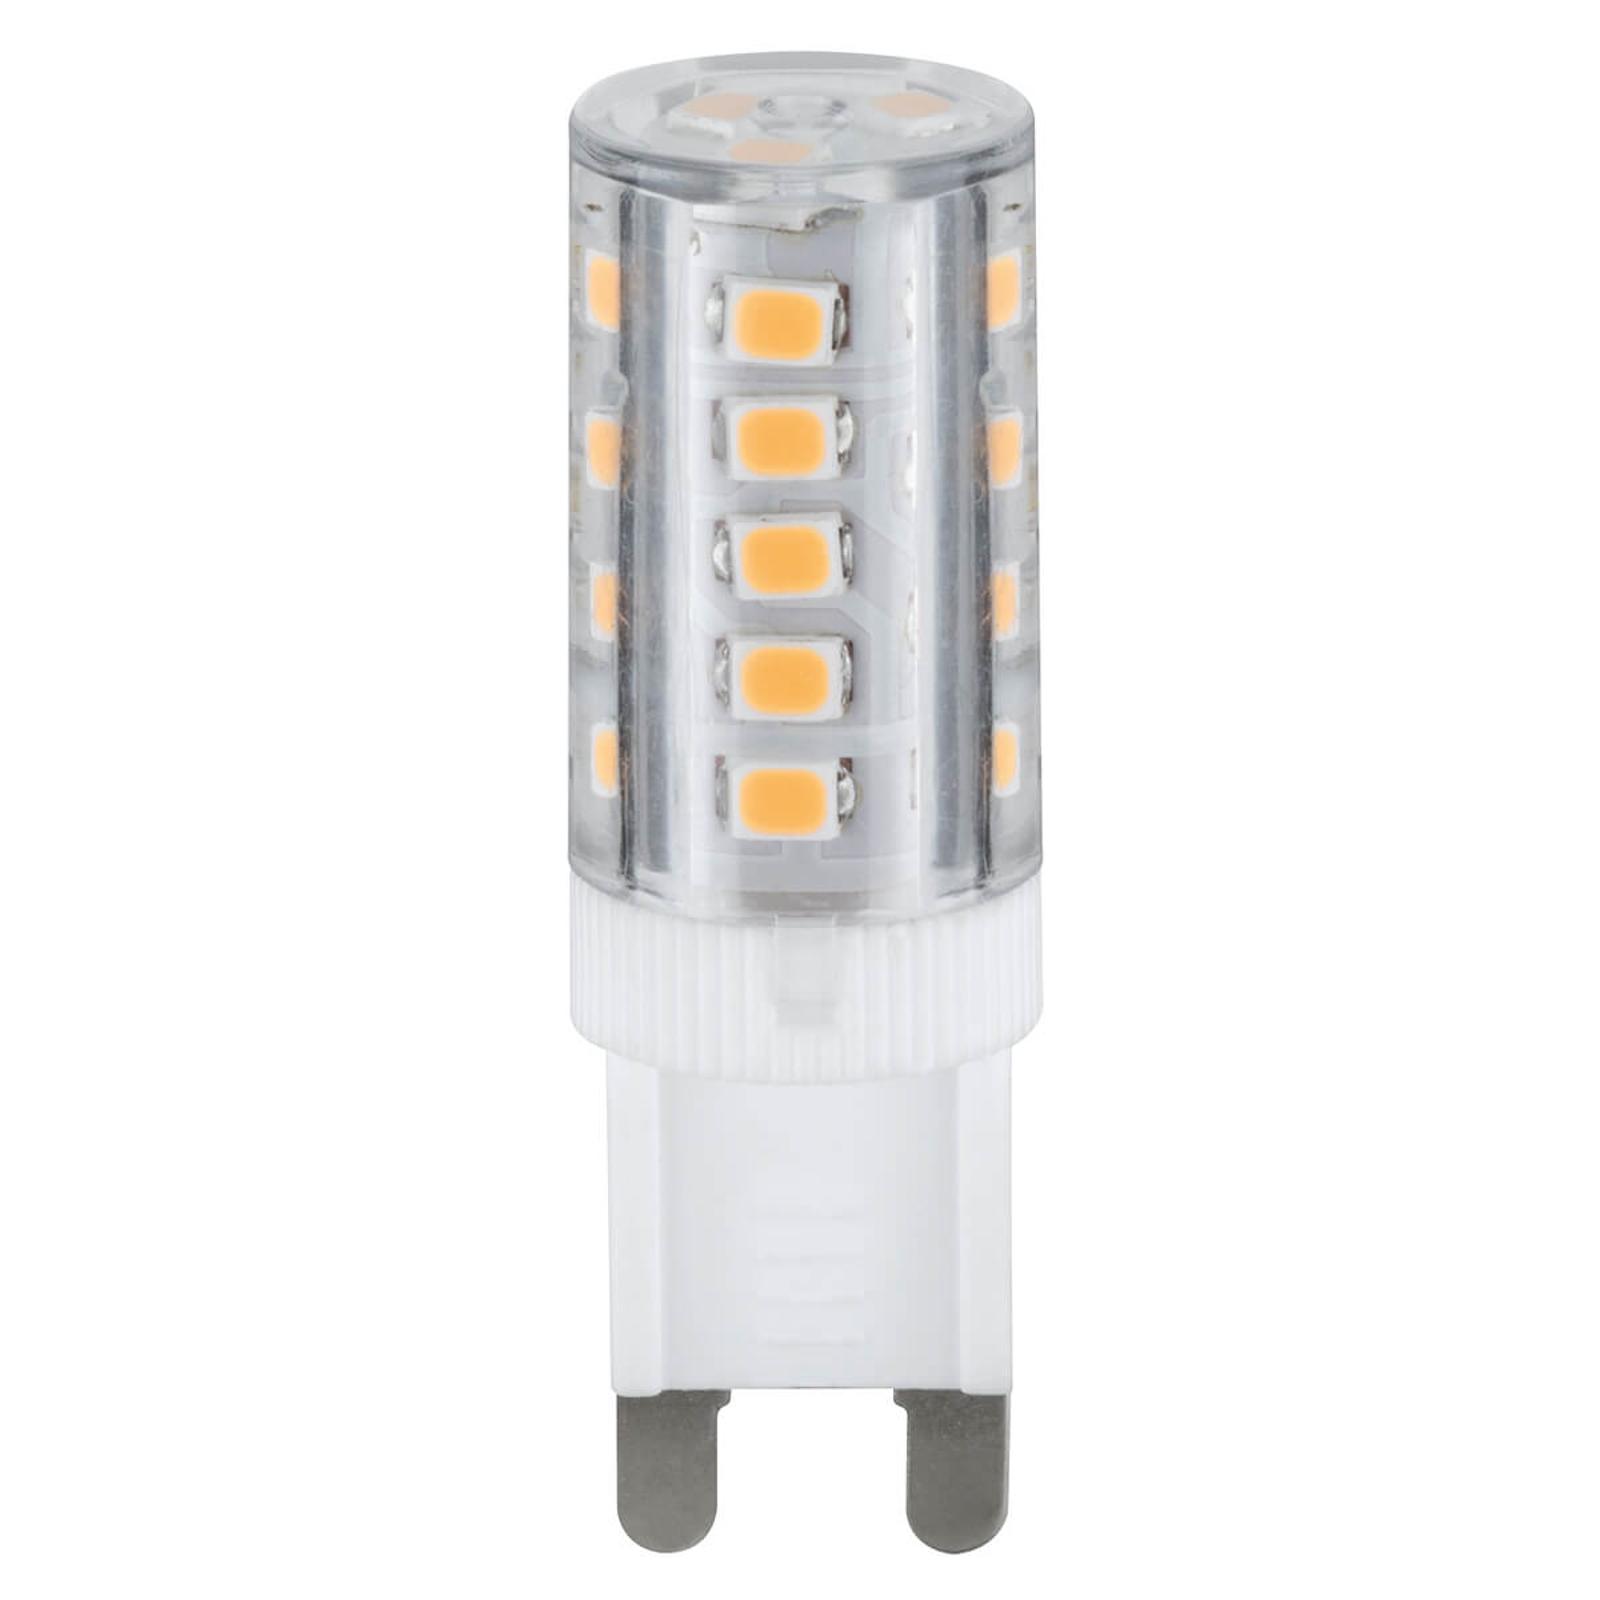 G9 3W 827 lampadina LED bispina dimmerabile